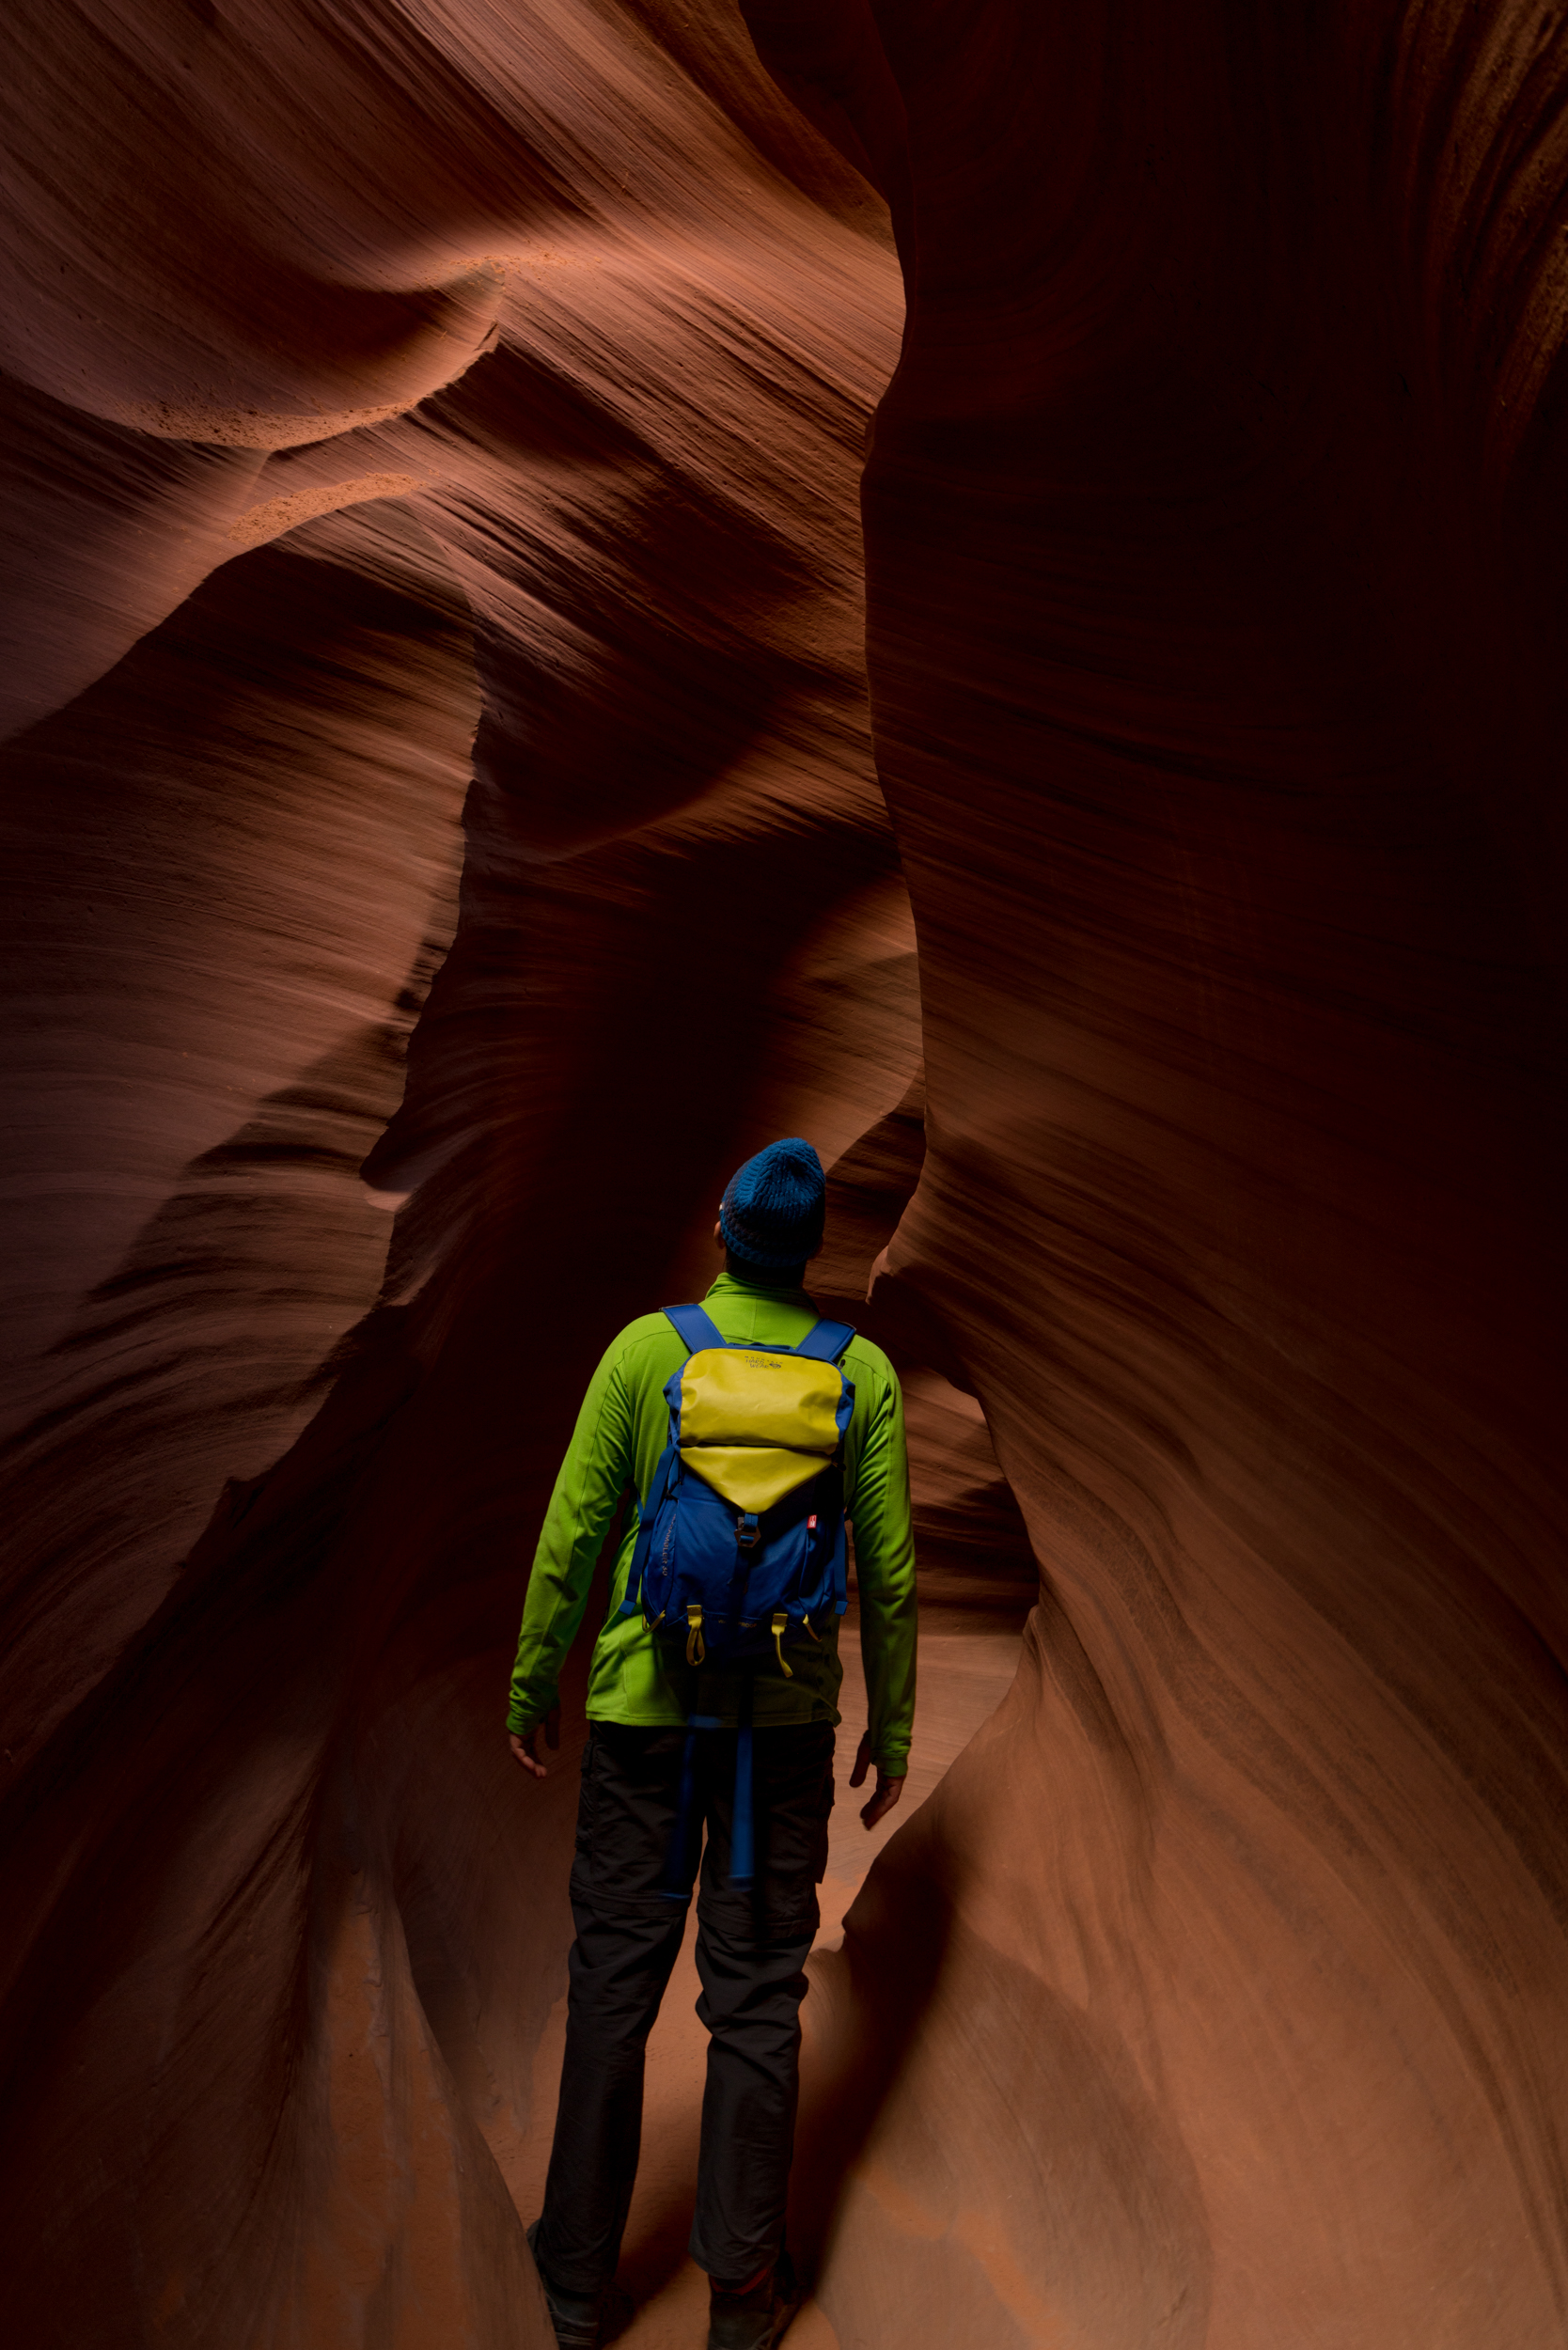 Lower Antelope Canyon, Arizona